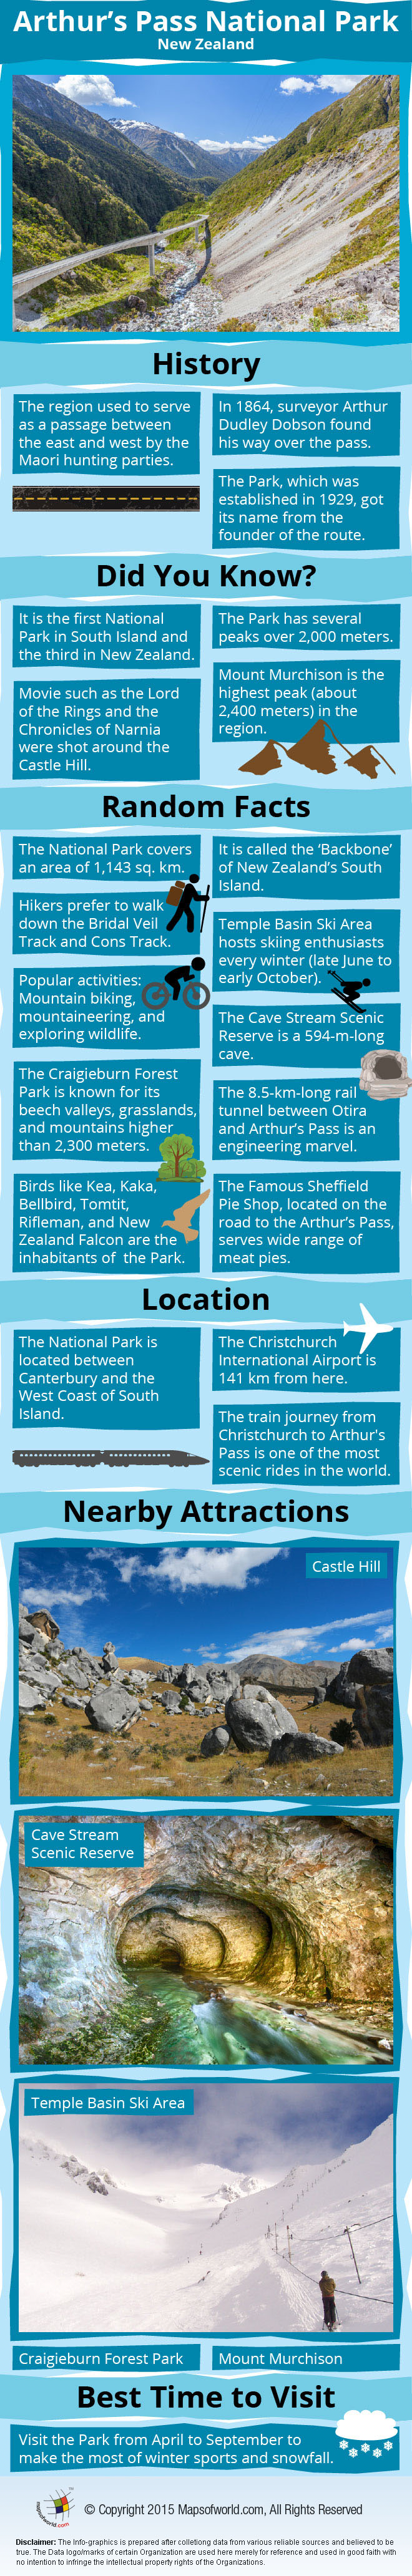 Arthurs Pass National Park Infographic